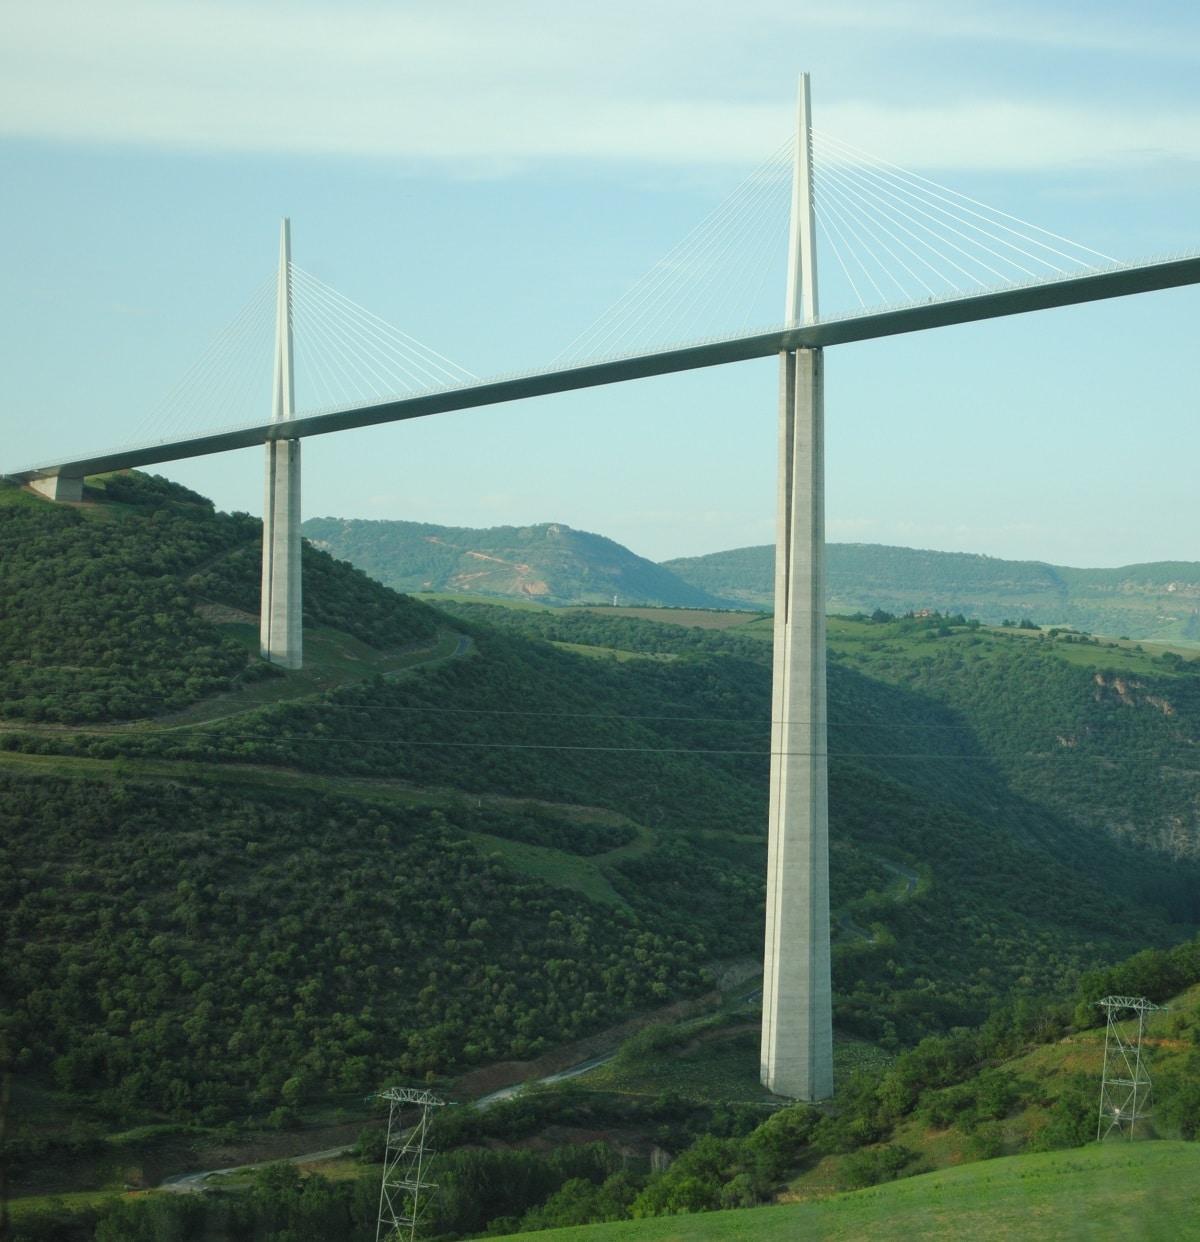 altura puente millau